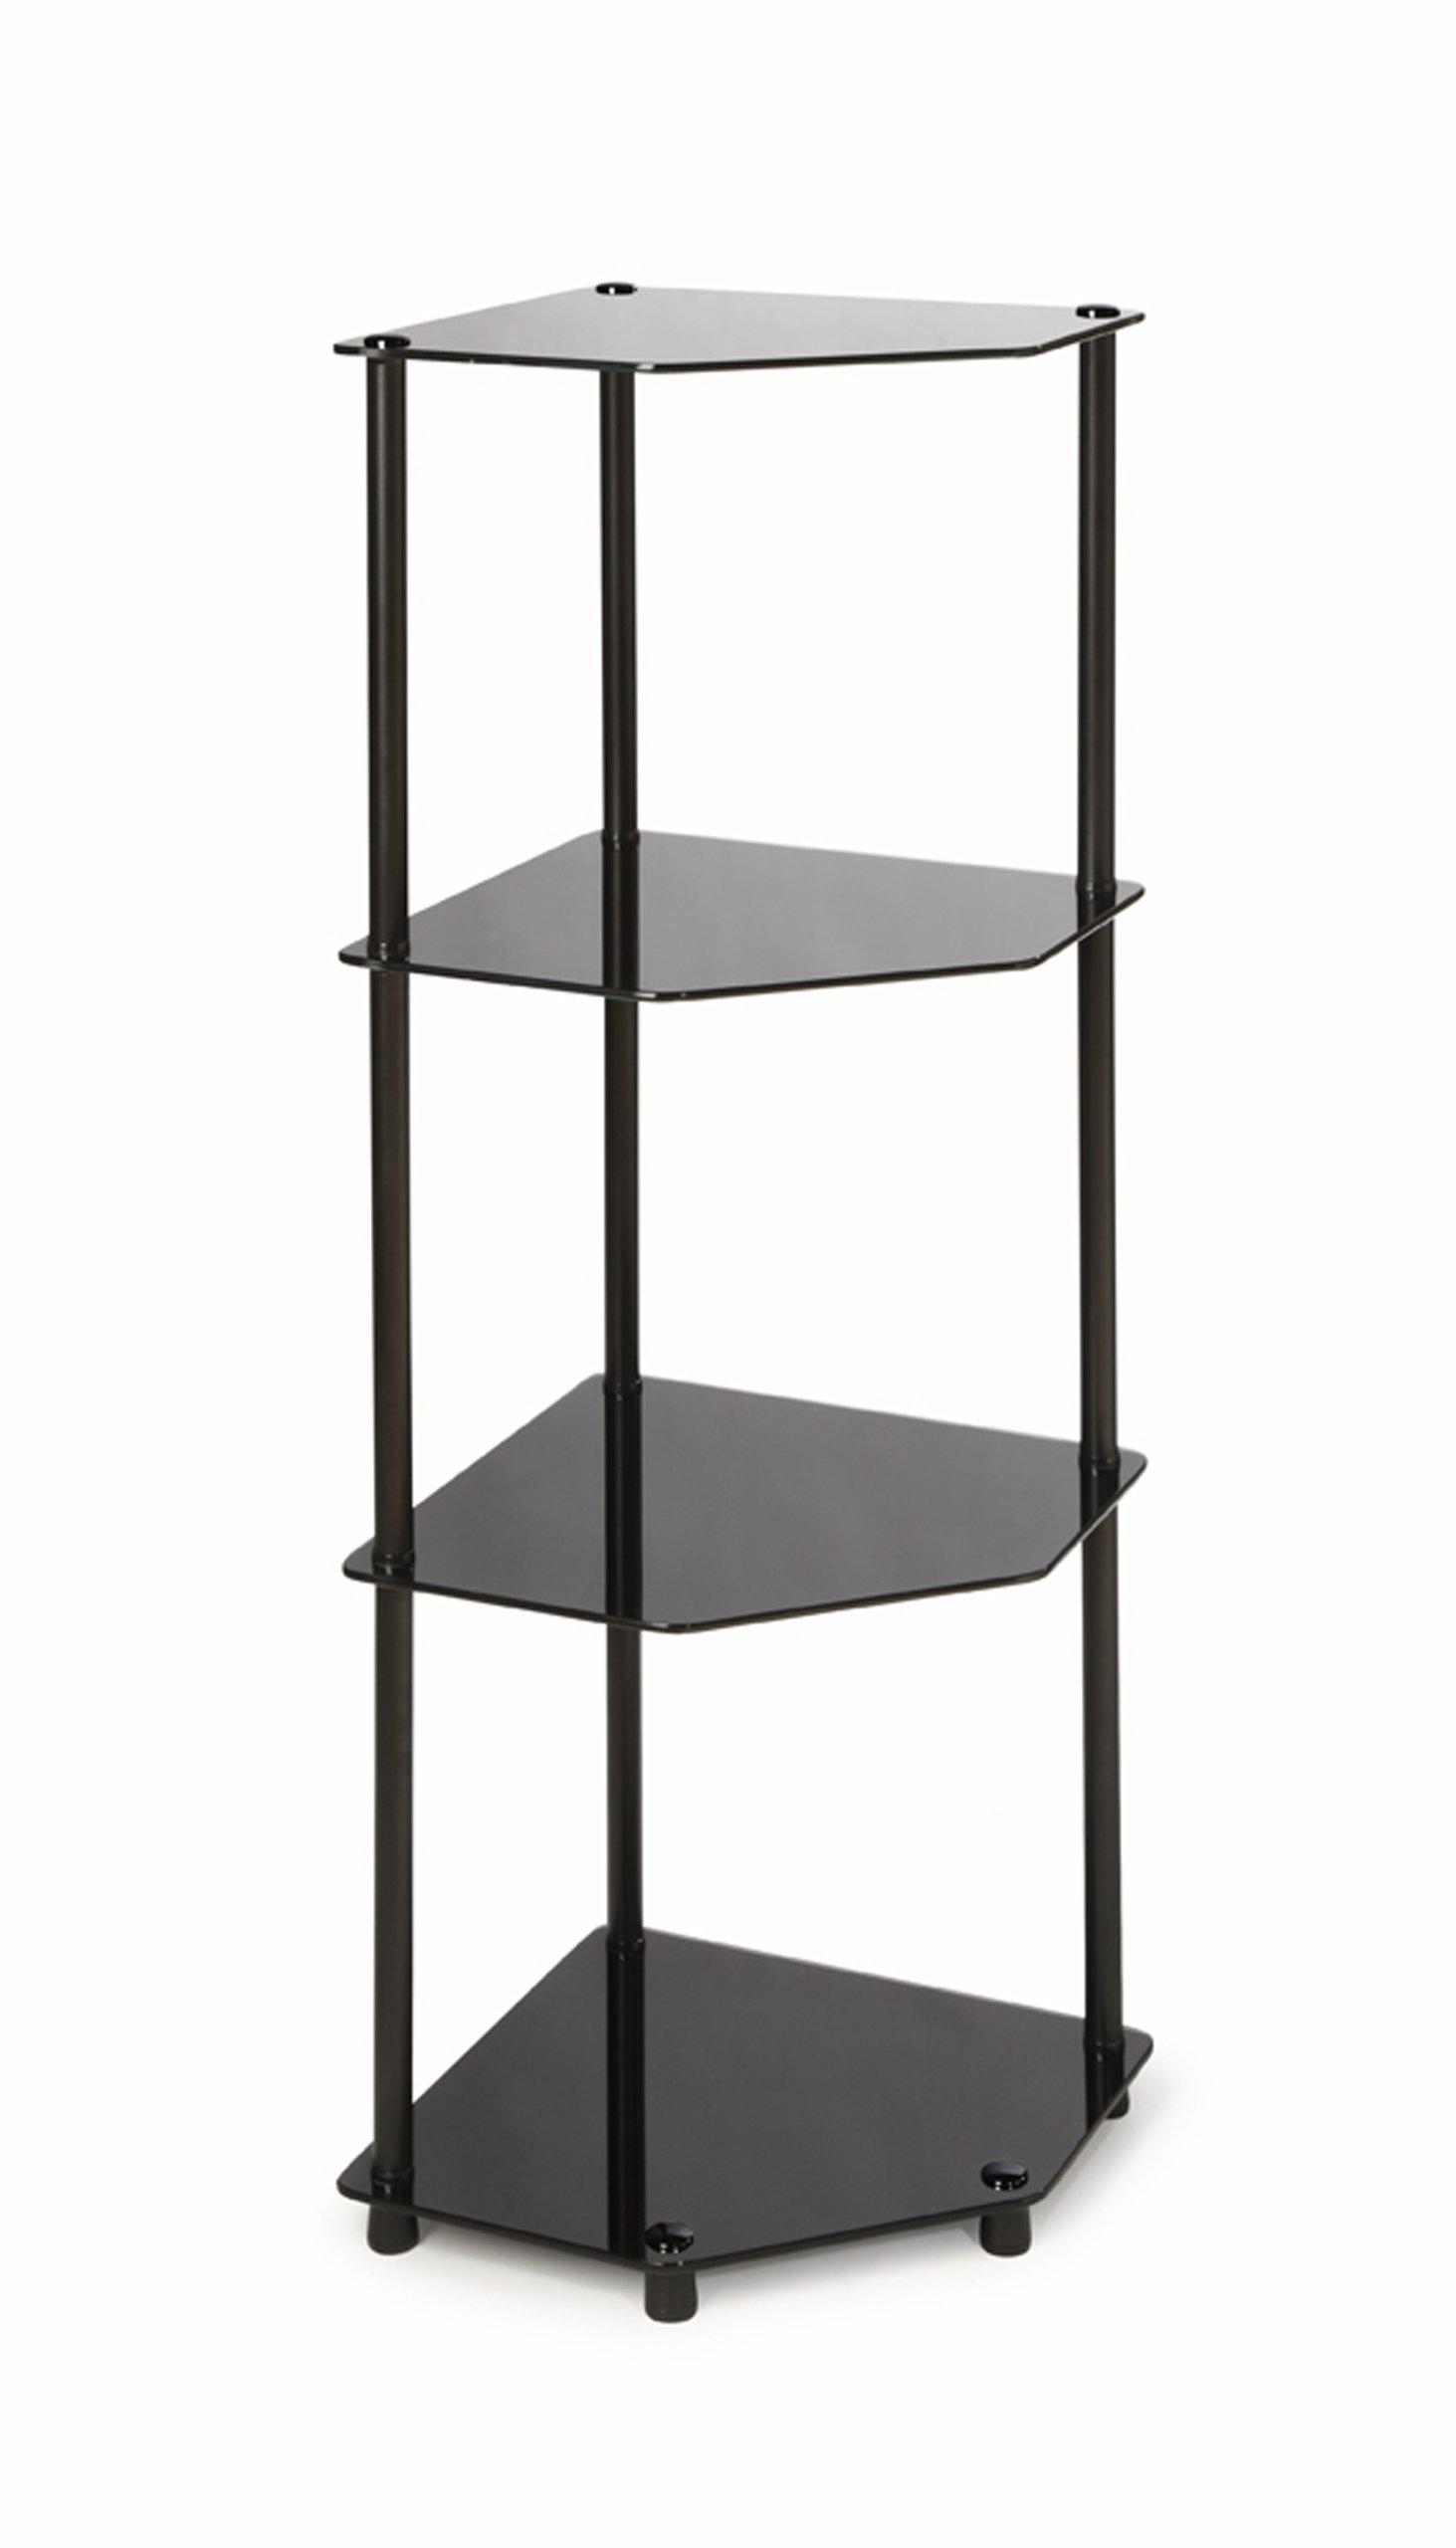 Convenience Concepts Designs2Go Midnight Classic 4-Tier Glass Corner Shelf, Black Glass